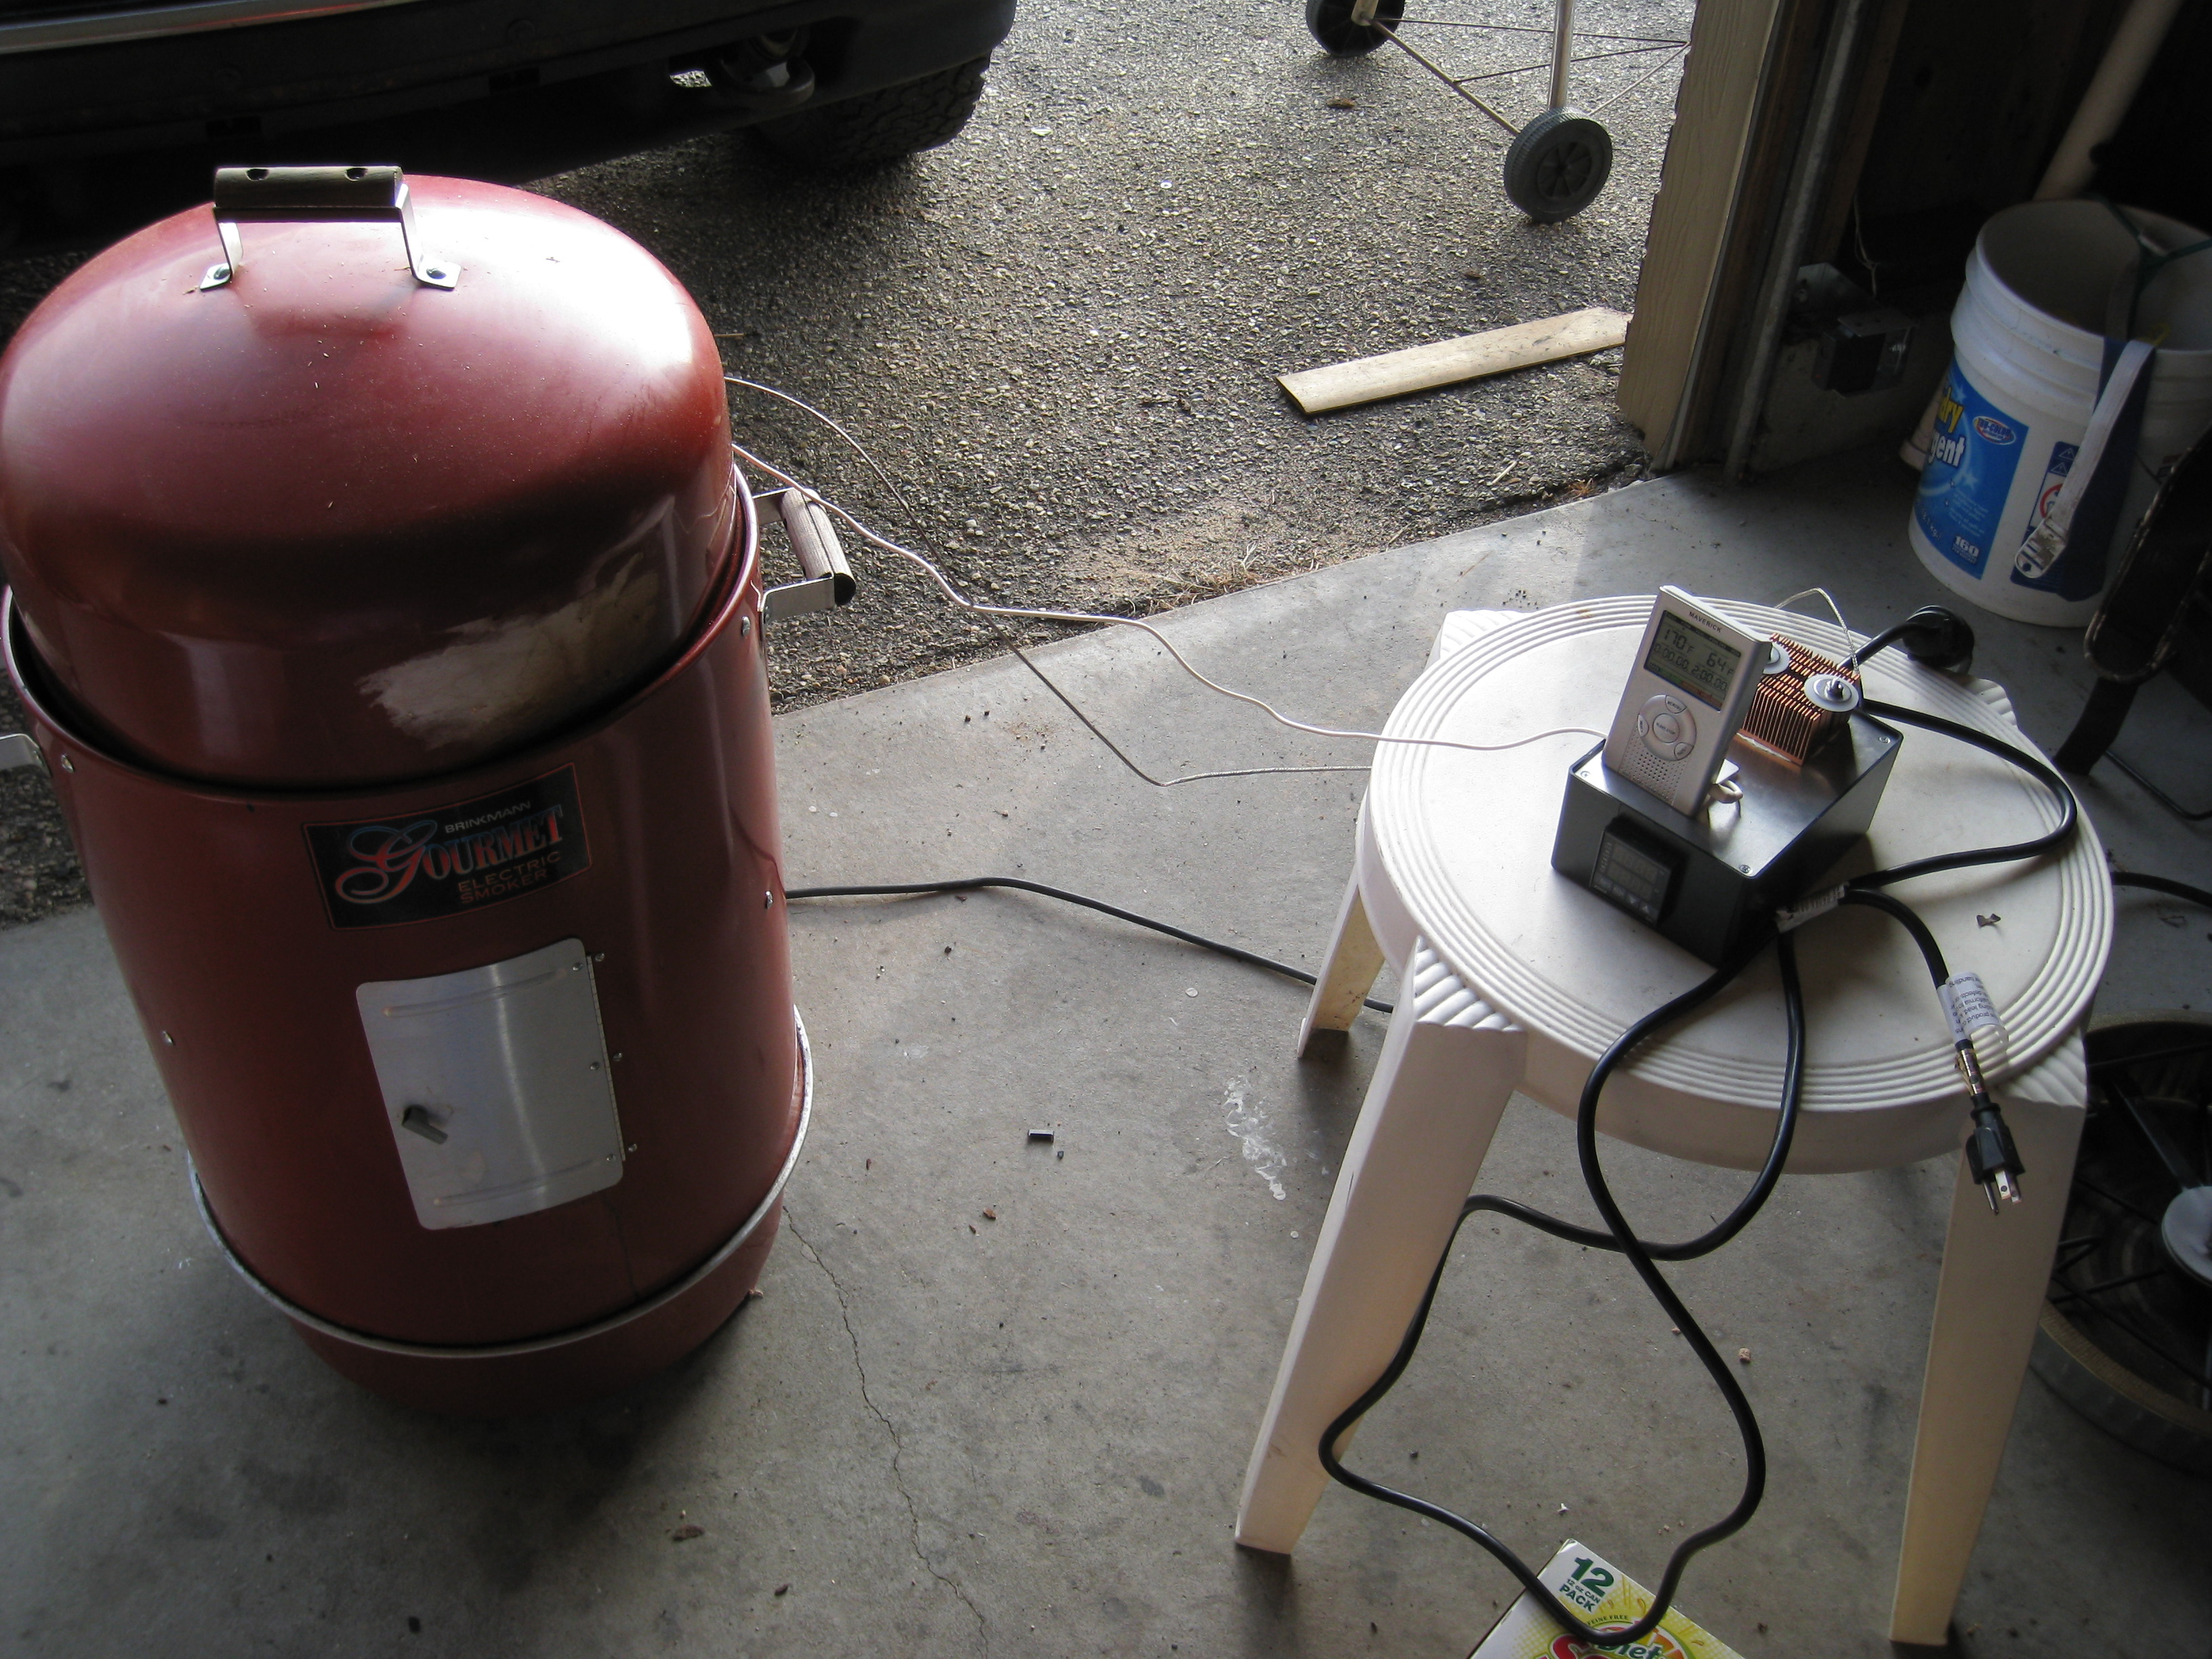 Taming my Brinkmann Gourmet Electric Smoker nate elston #3C485D